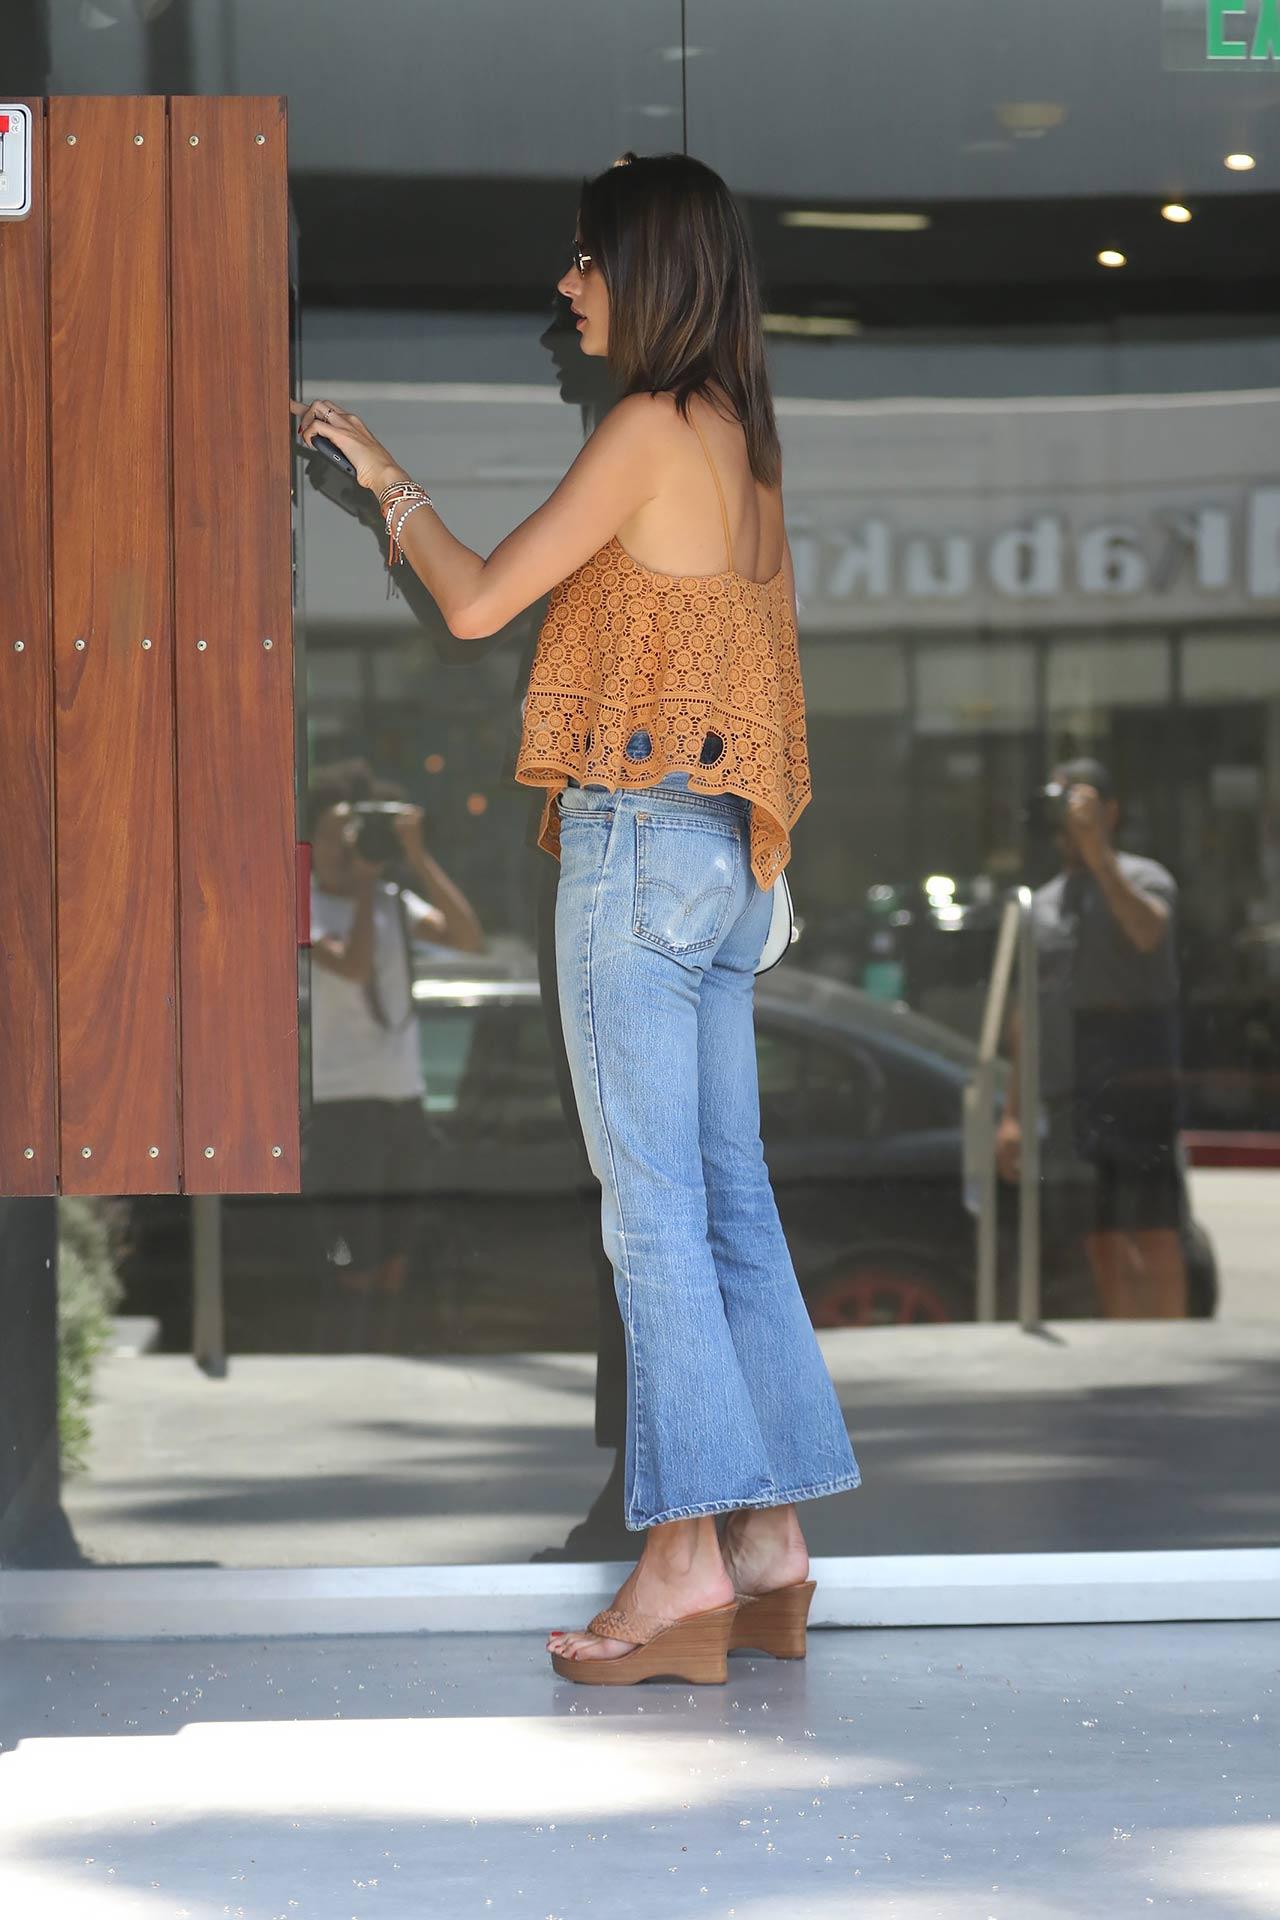 alessandra-ambrosio-redone-levis-jeans